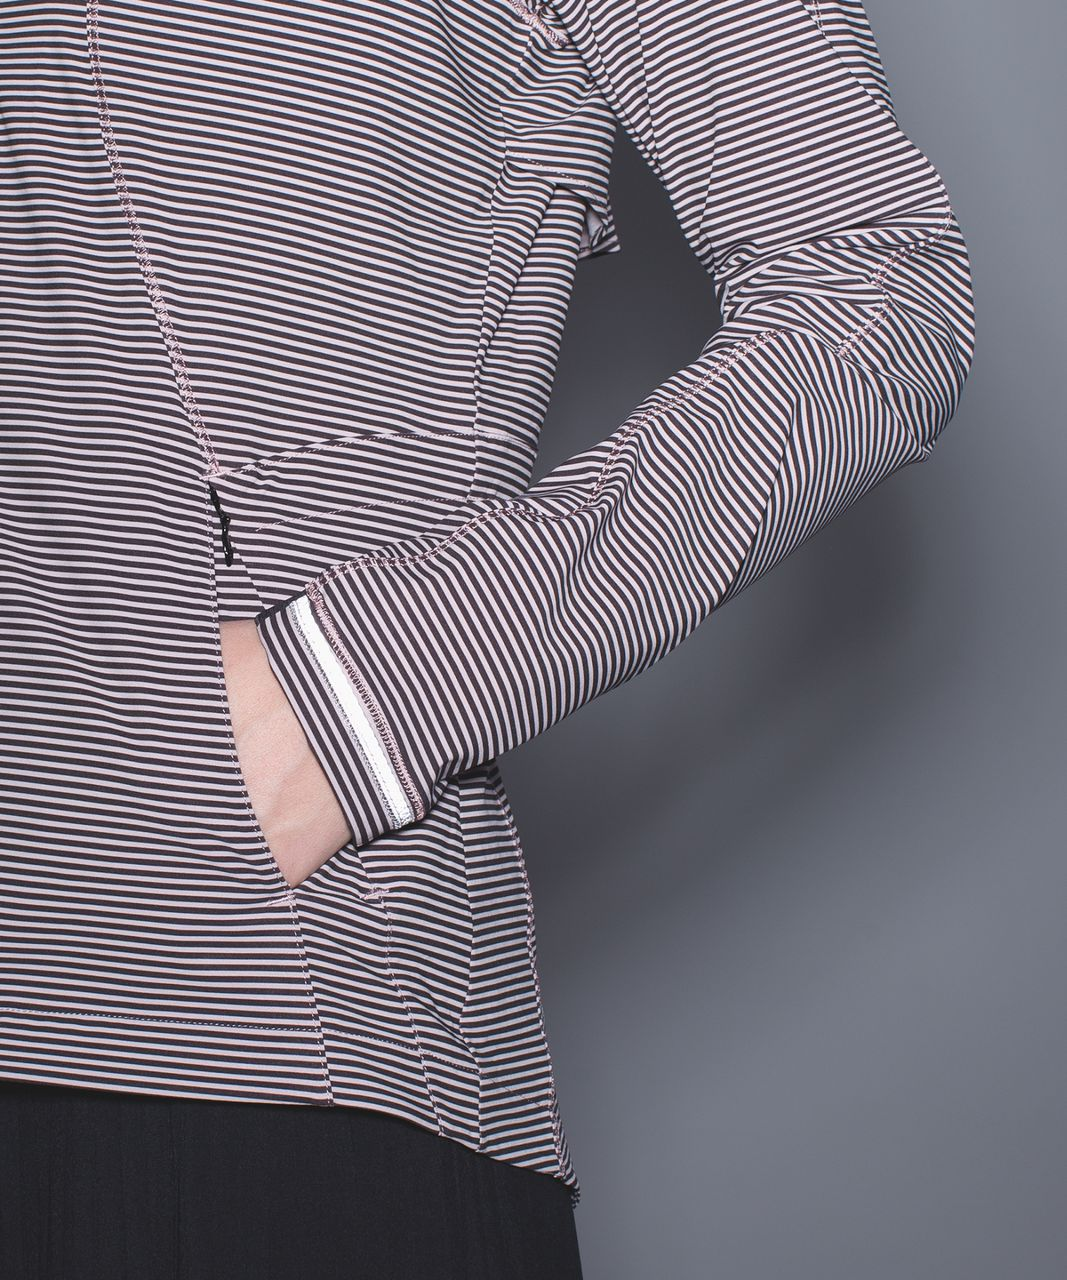 Lululemon Go The Distance Jacket - Mini Pop Stripe Printed Mink Berry Black